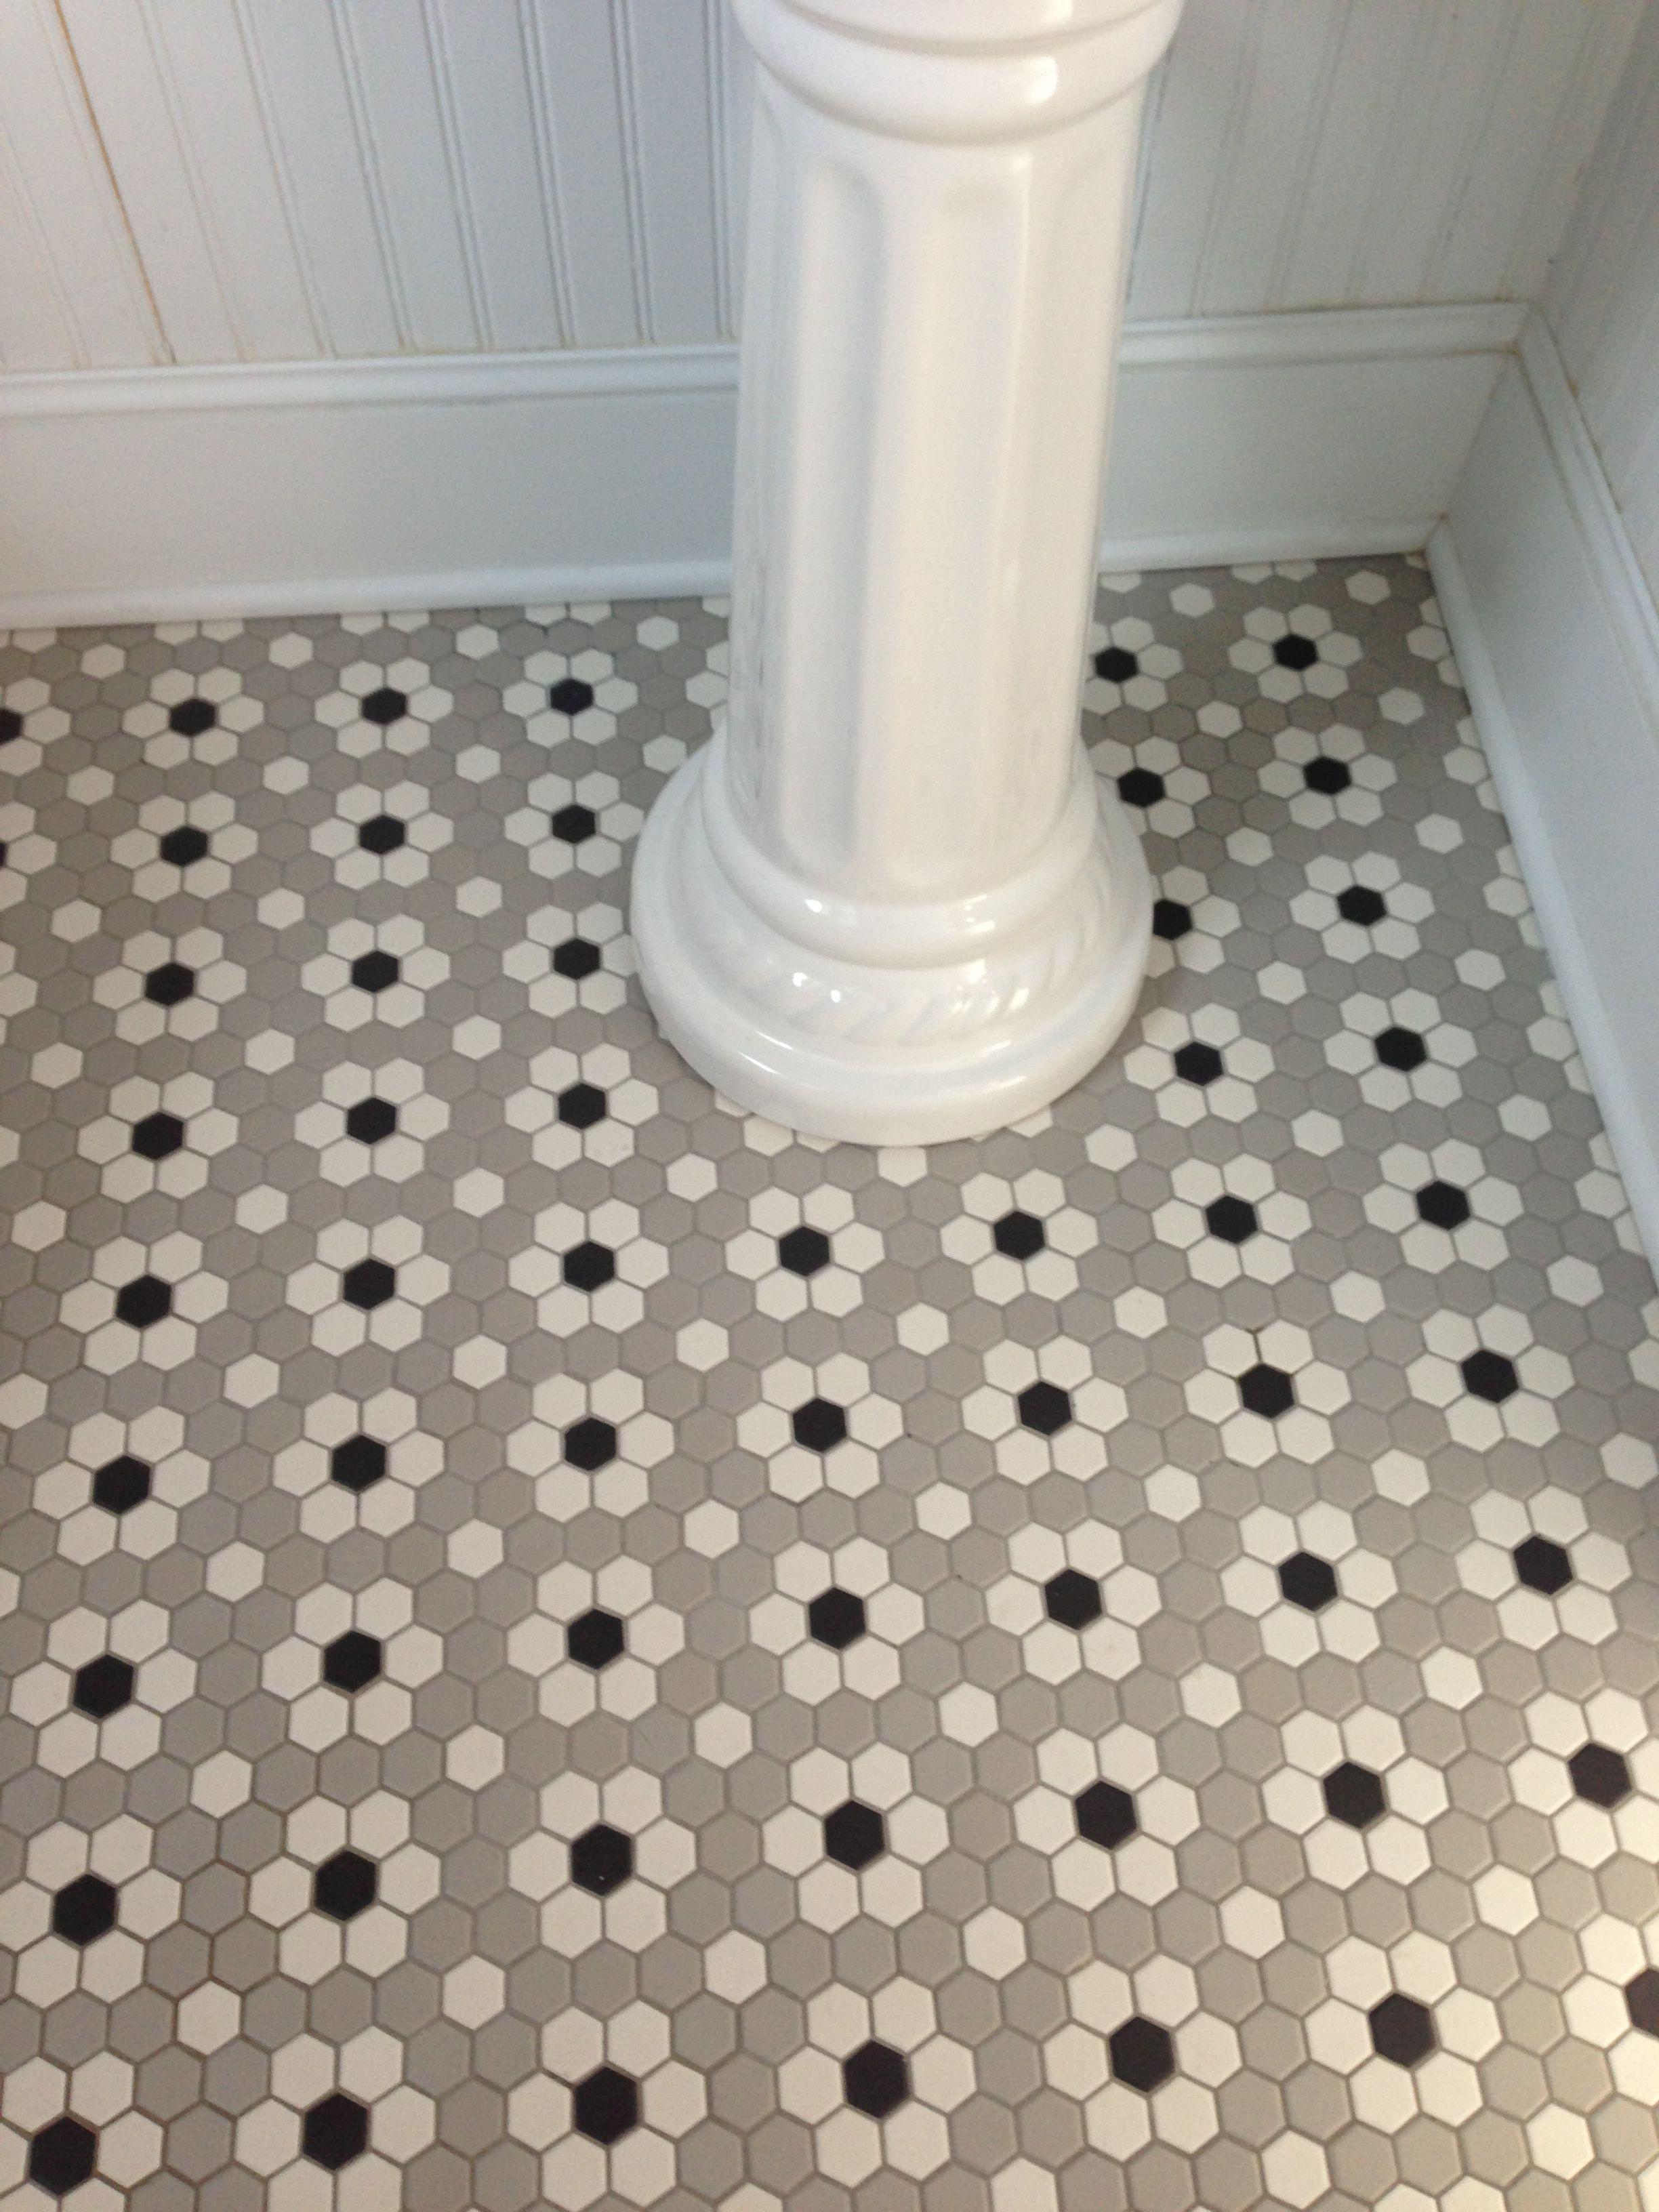 35 Grey Mosaic Bathroom Tiles Ideas And Pictures Mosaic Bathroom